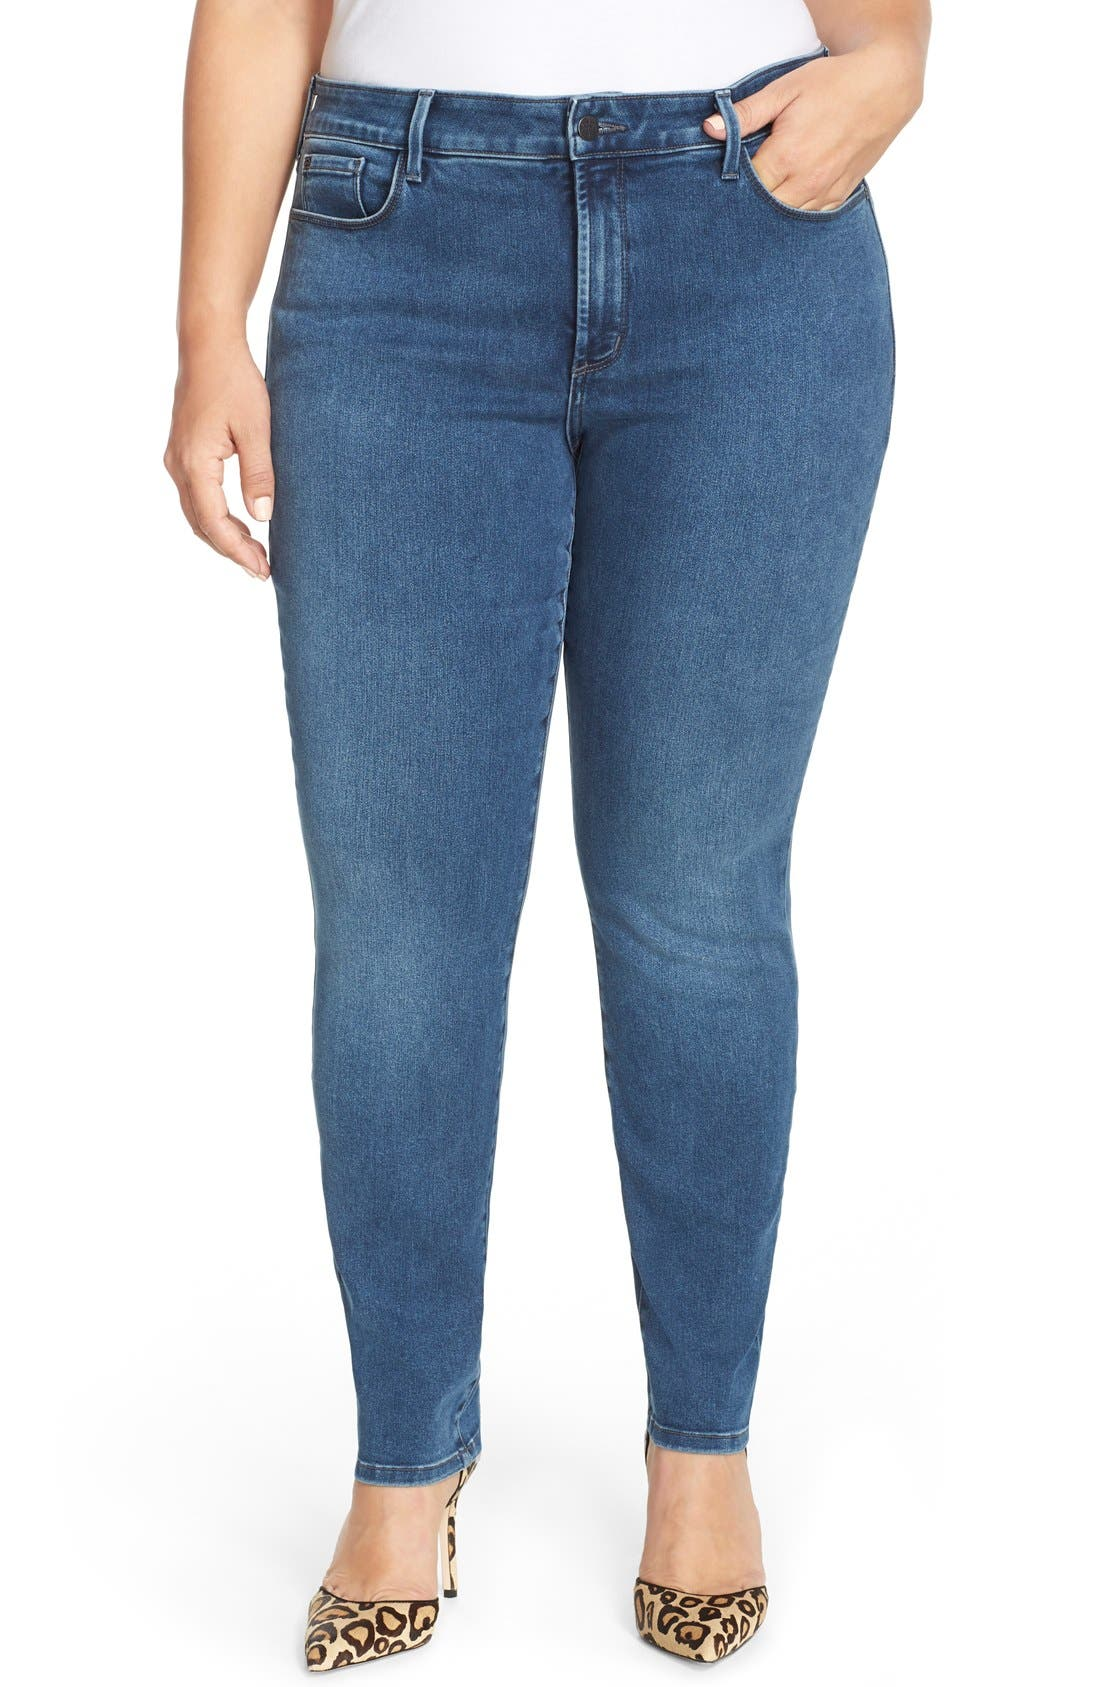 NYDJ, 'Alina' Stretch Skinny Jeans, Main thumbnail 1, color, 461